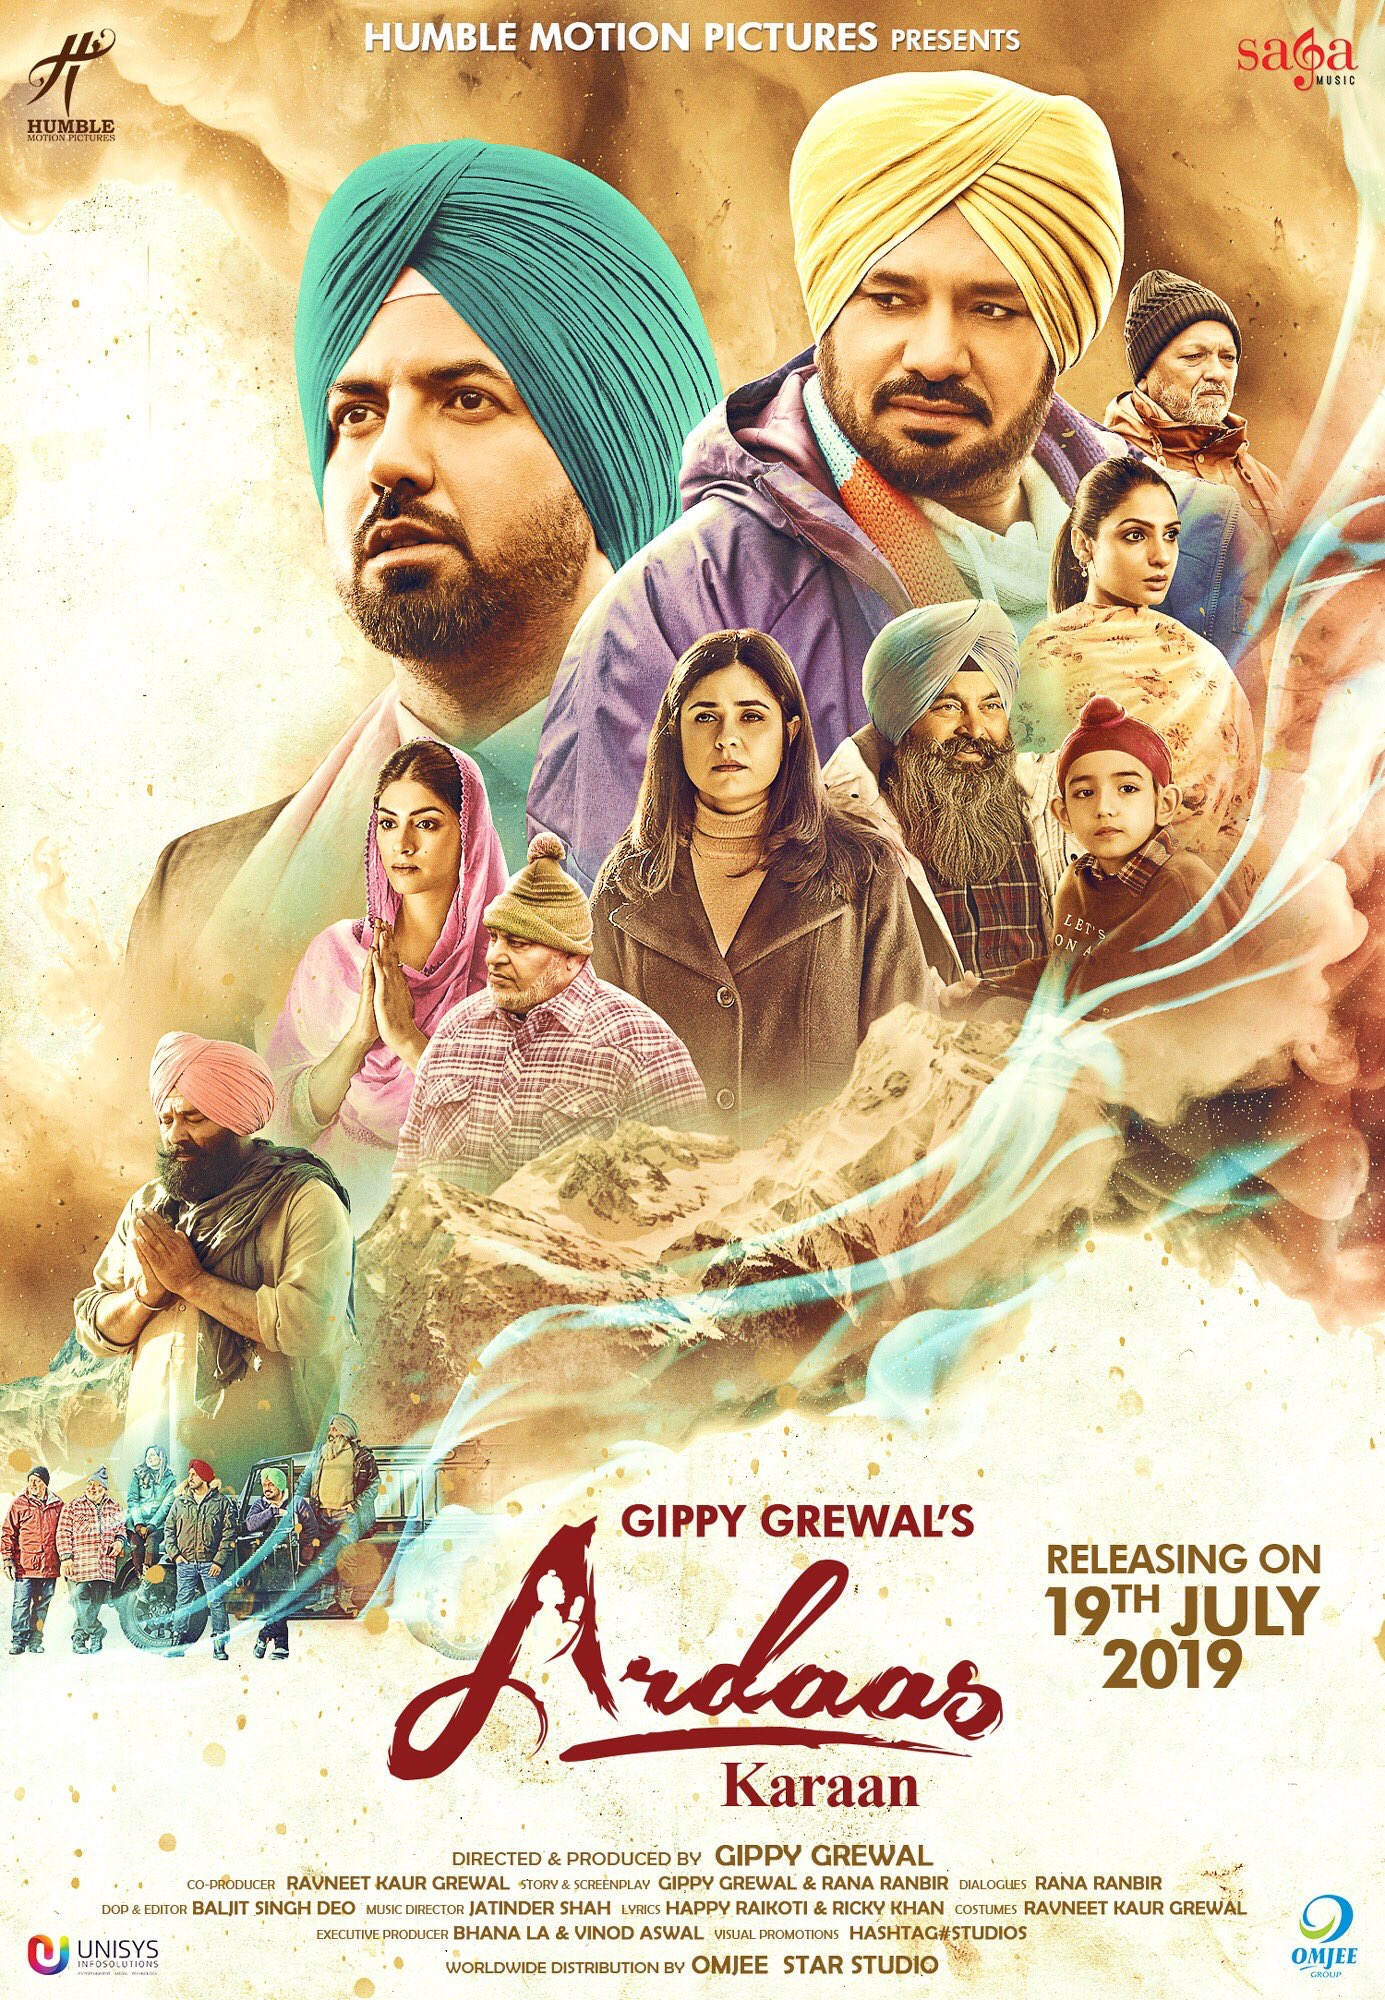 Ardaas Karaan (2019) Punjabi 1080p WEB-DL AVC DDP5.1-DUS.Exclusive